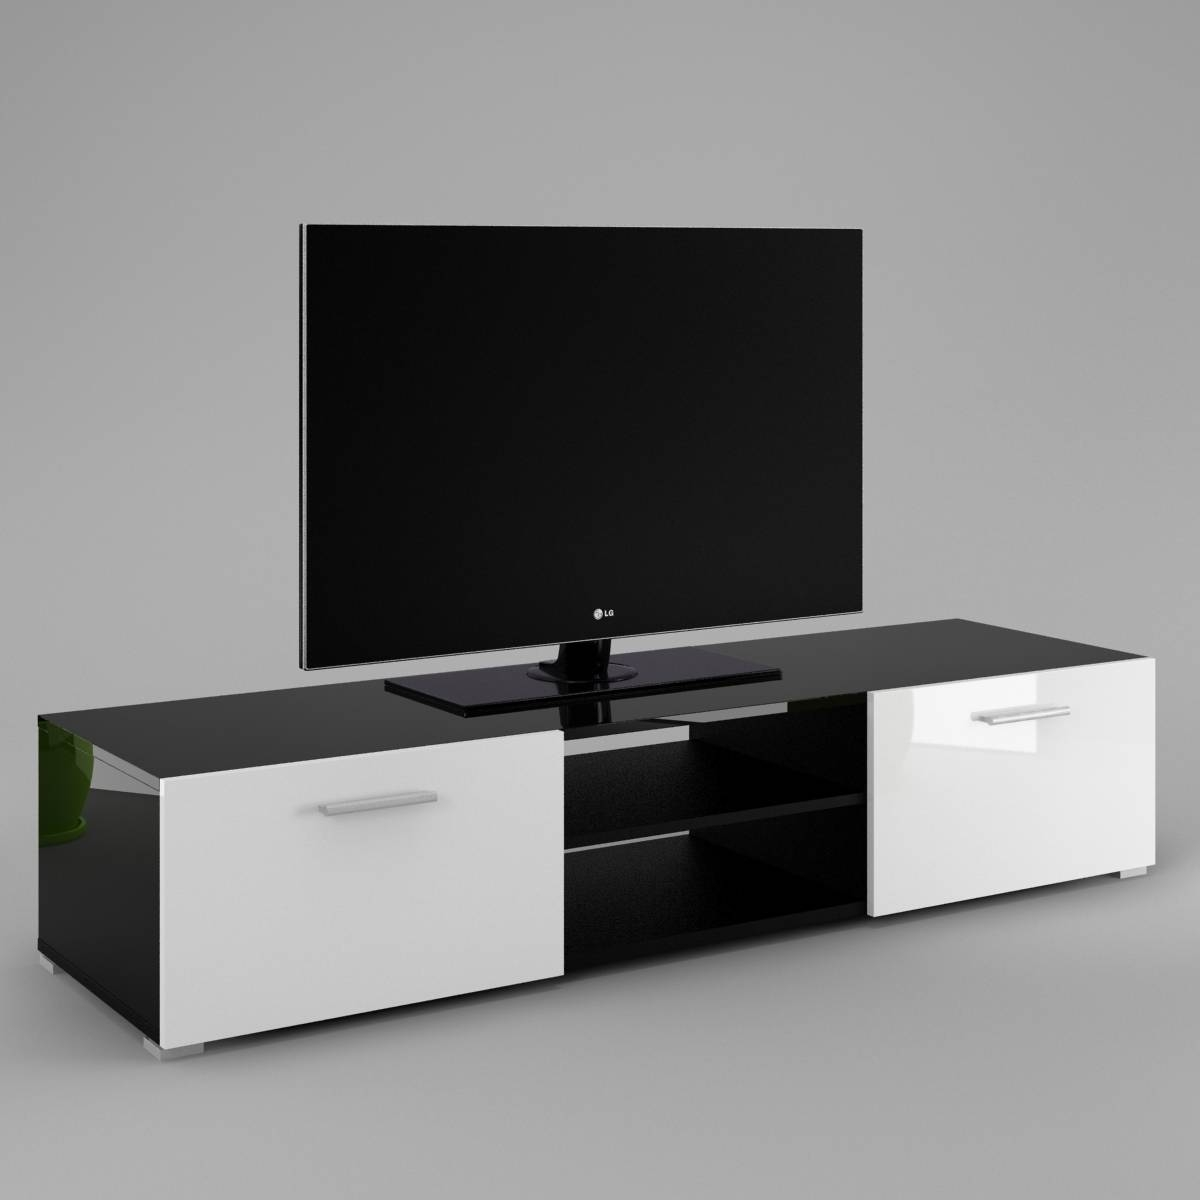 Tv Cabinet Luna - Labi Furniturelabi Furniture within Black Gloss Tv Cabinet (Image 14 of 15)